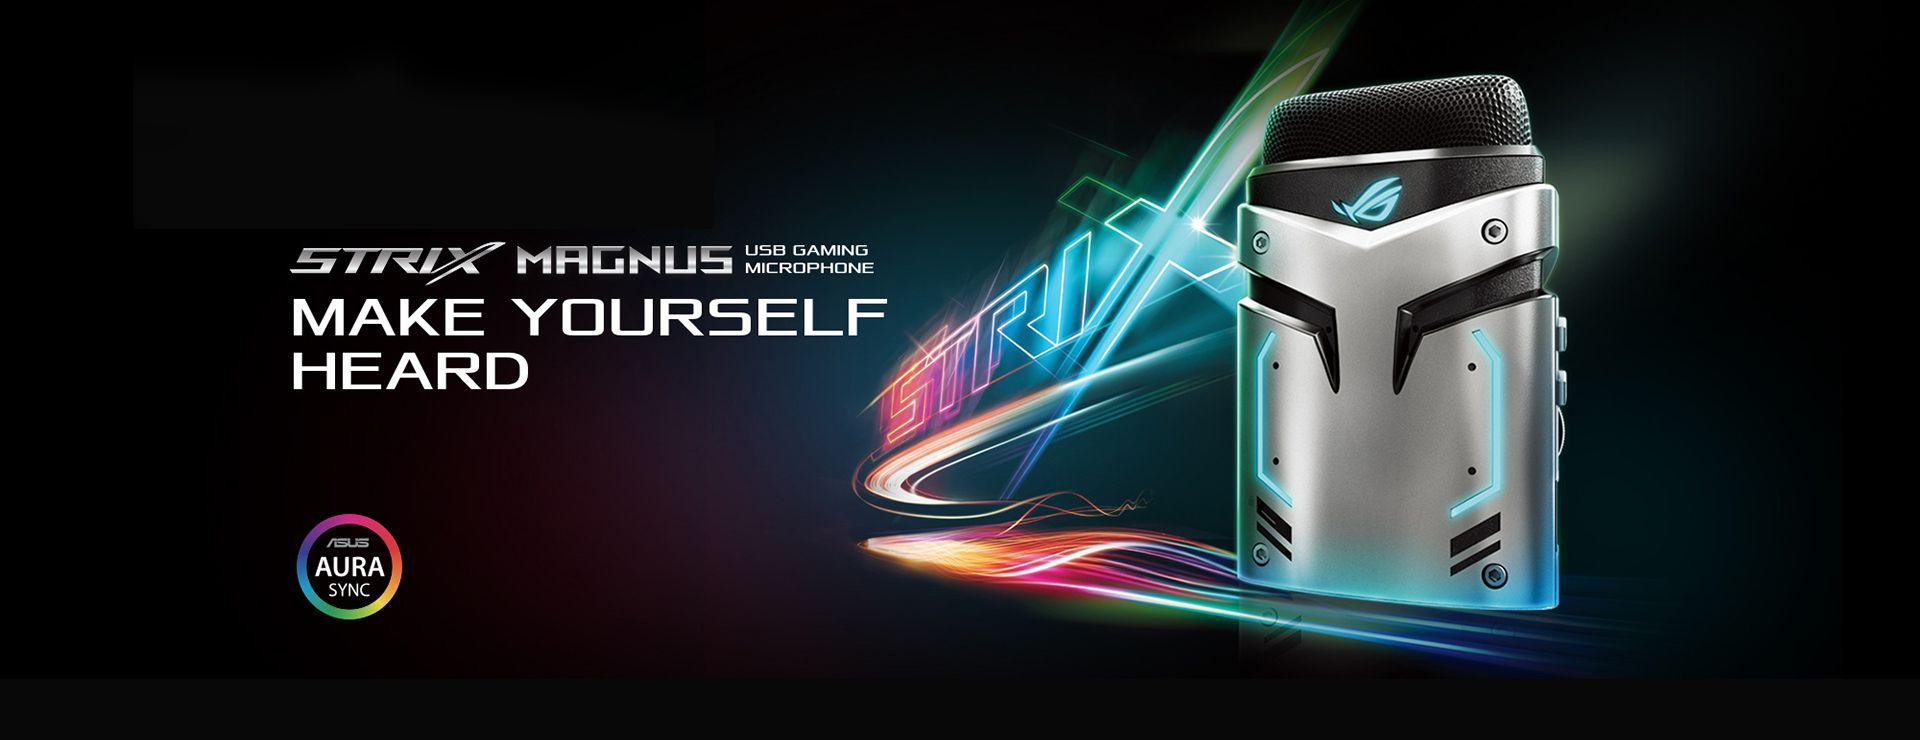 Strix Magnus USB Gaming Microphone